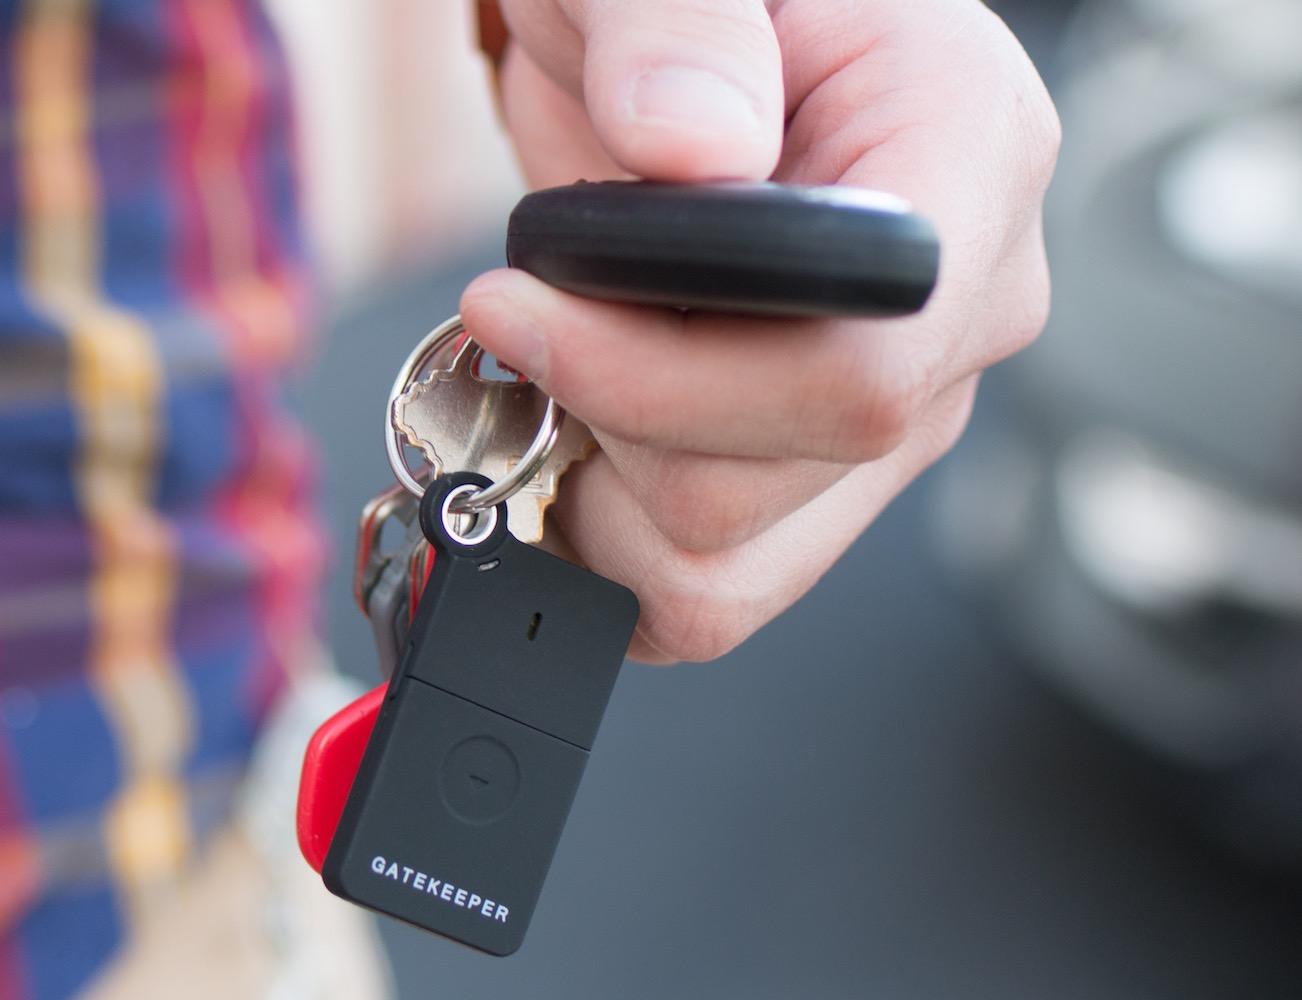 GateKeeper+2.0+Wireless+Key+%26amp%3B+Lock